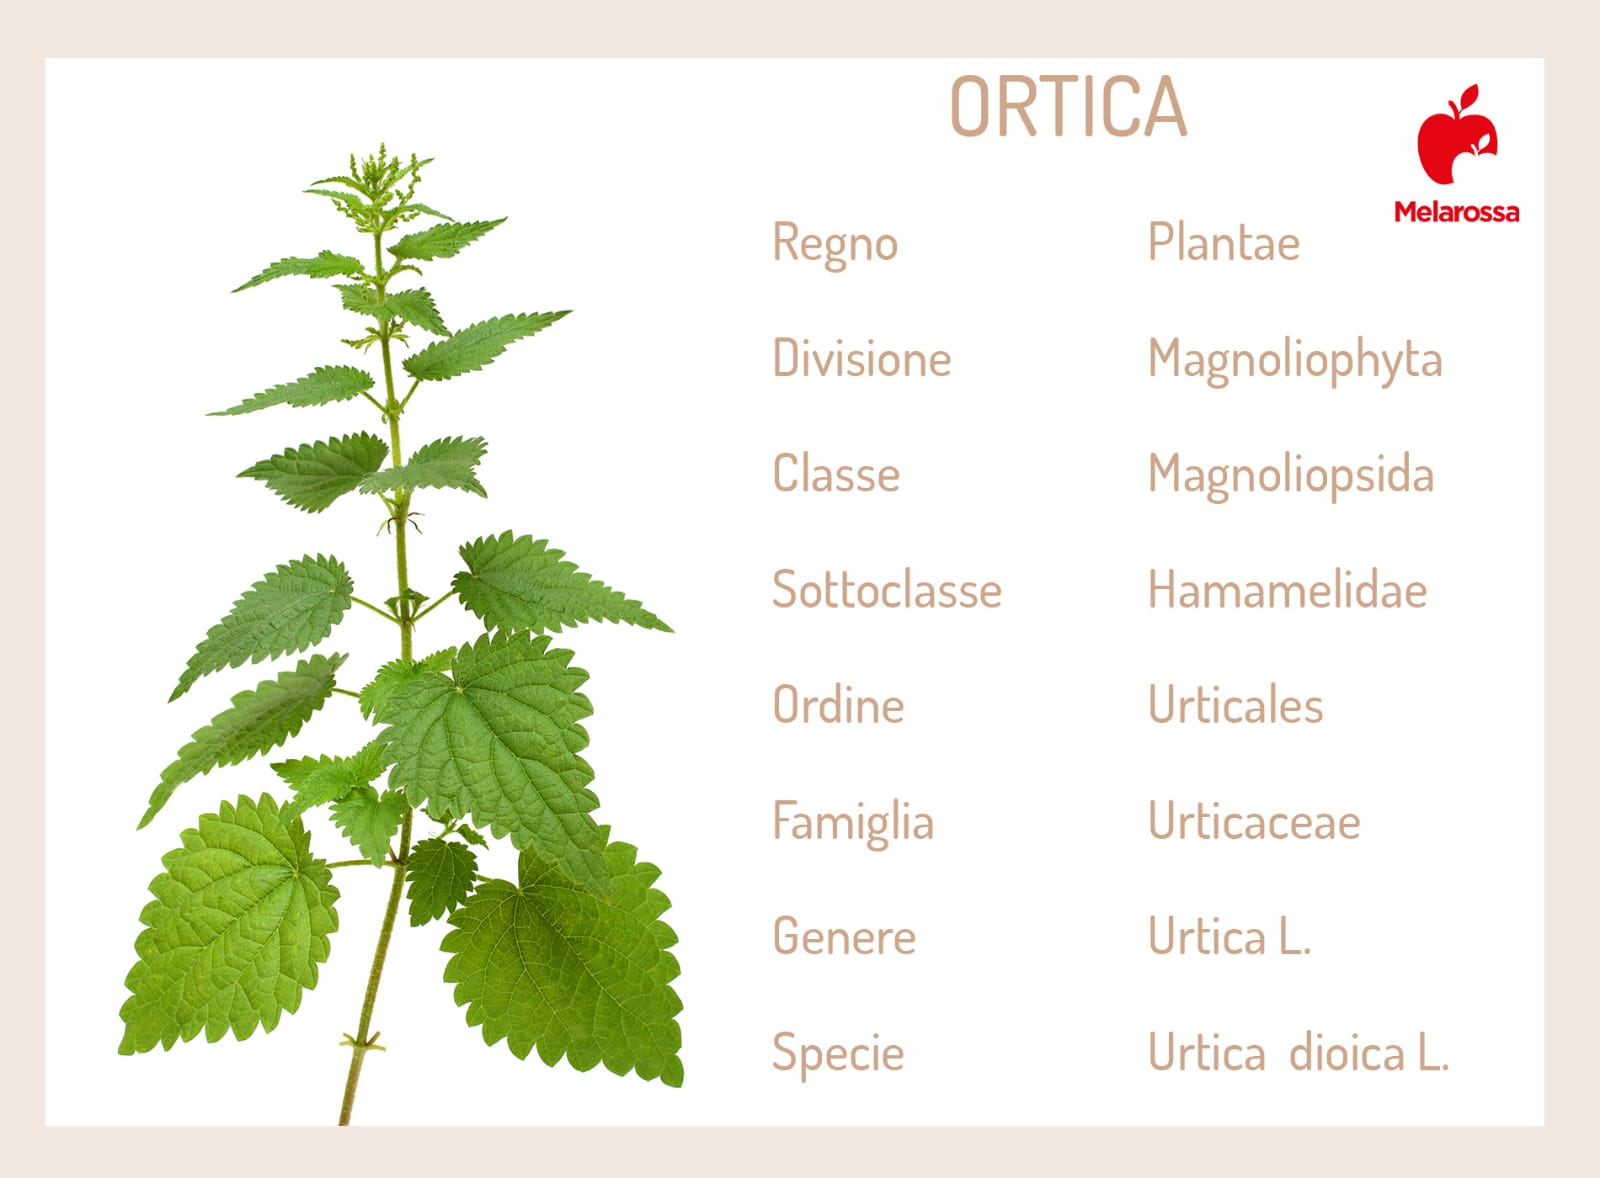 L'ortica è una pianta officinale dalle grandi proprietà e usi sia in cucina sia in bellezza